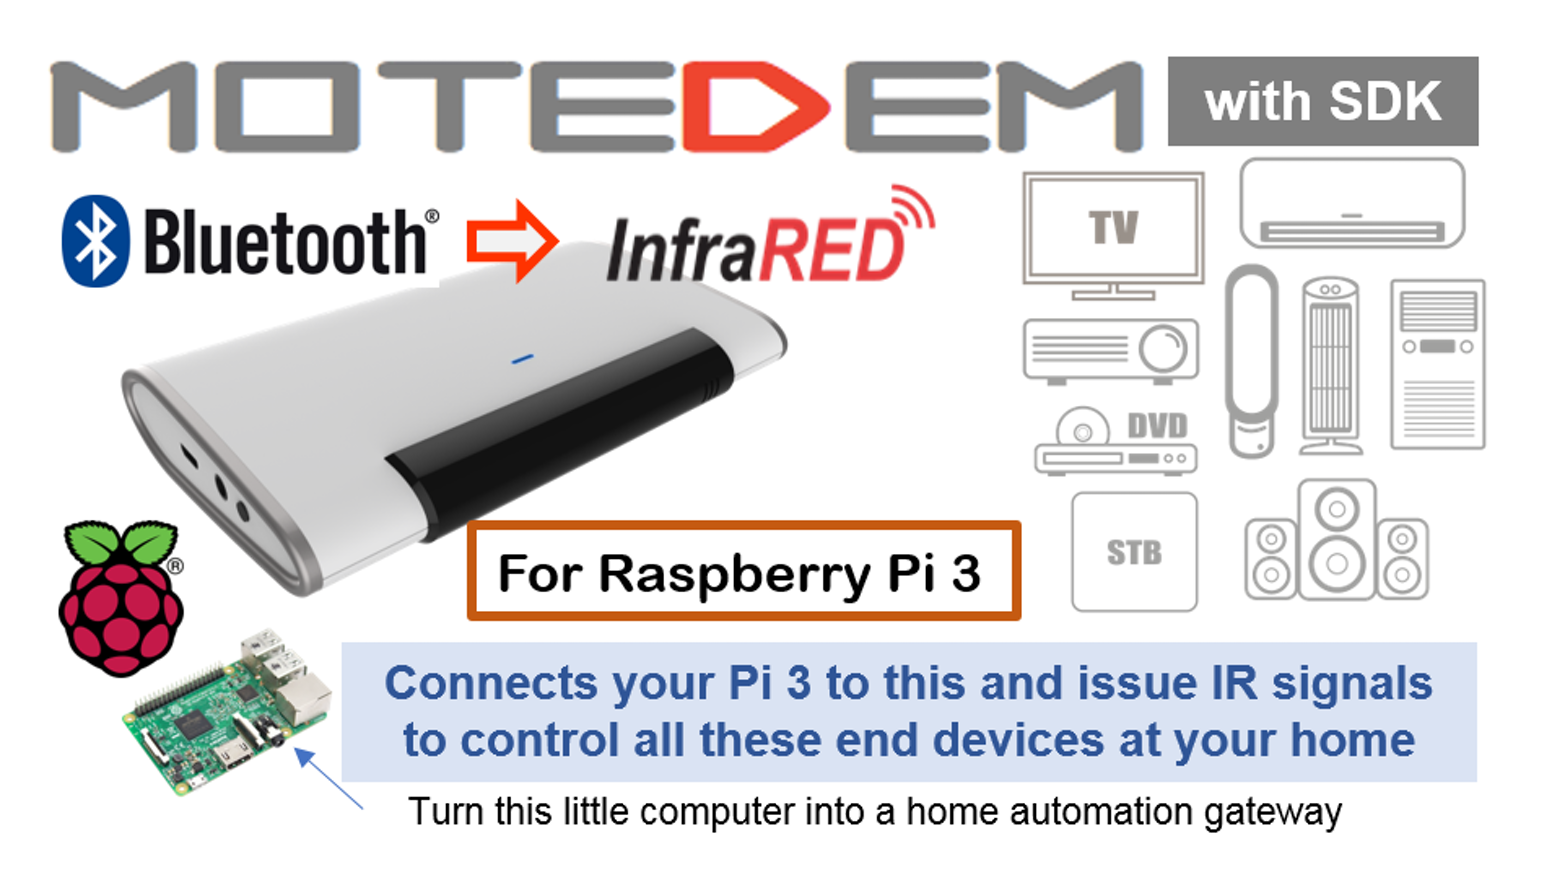 MOTEDEM Infrared blaster with SDK for Raspberry PI 3 by Little